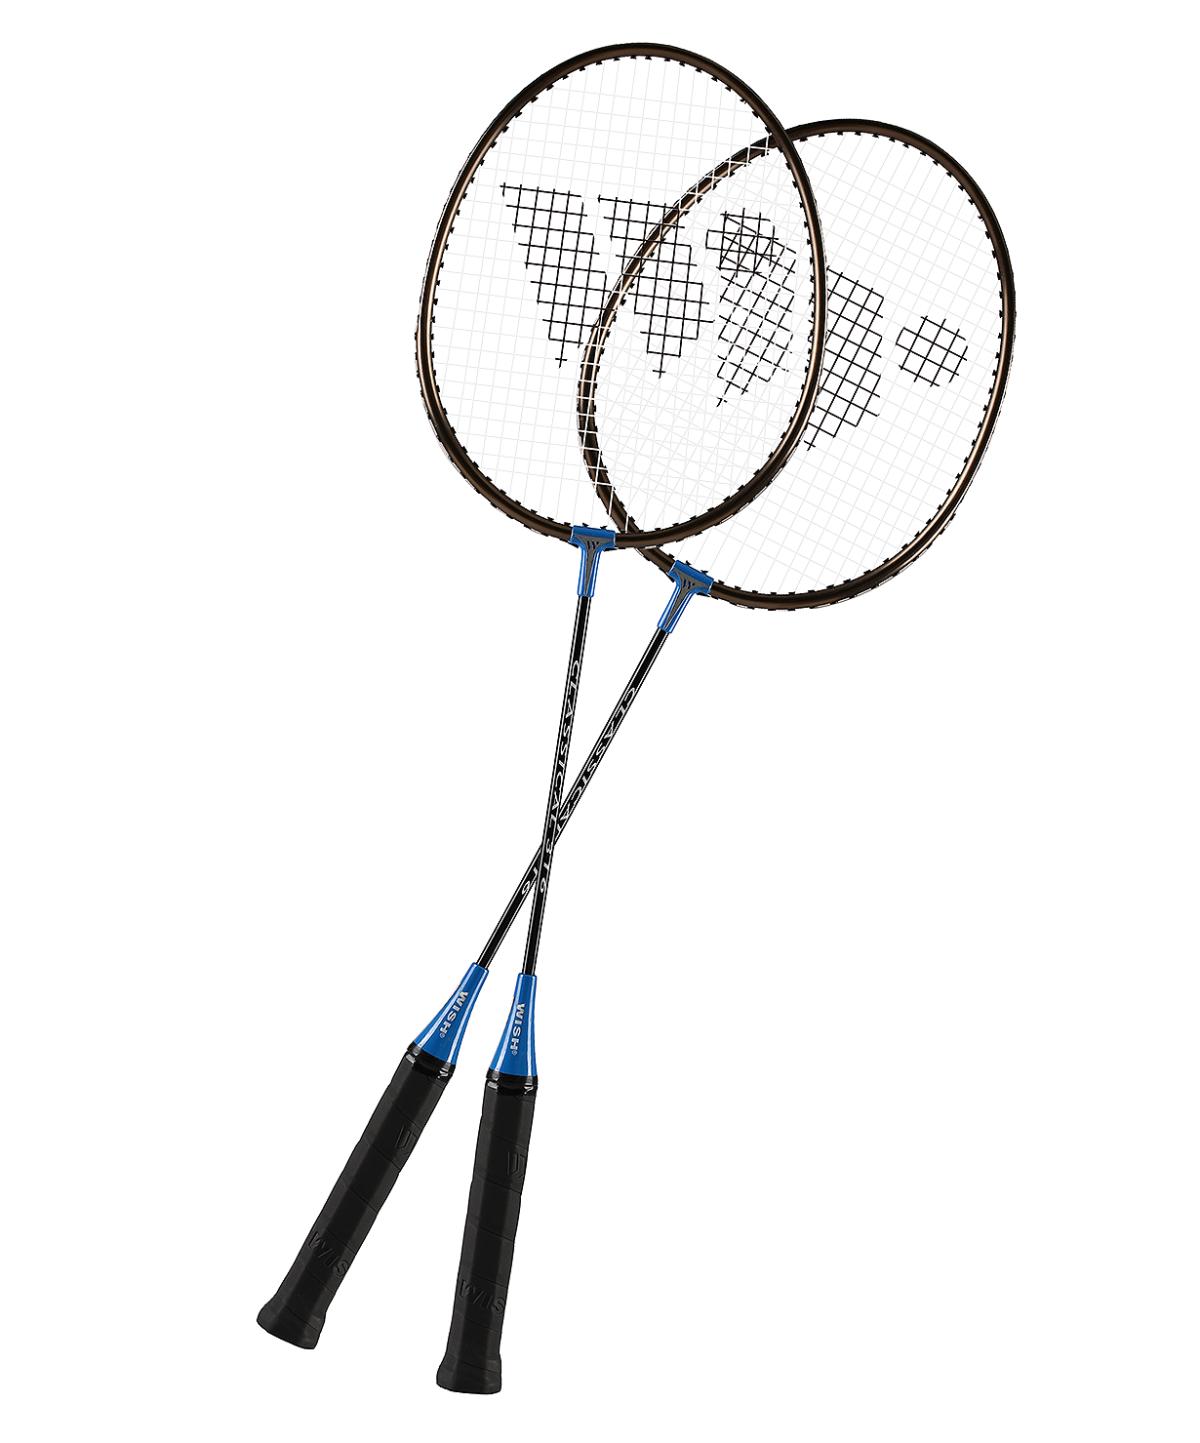 WISH Classic Набор для бадминтона   316: синий - 2